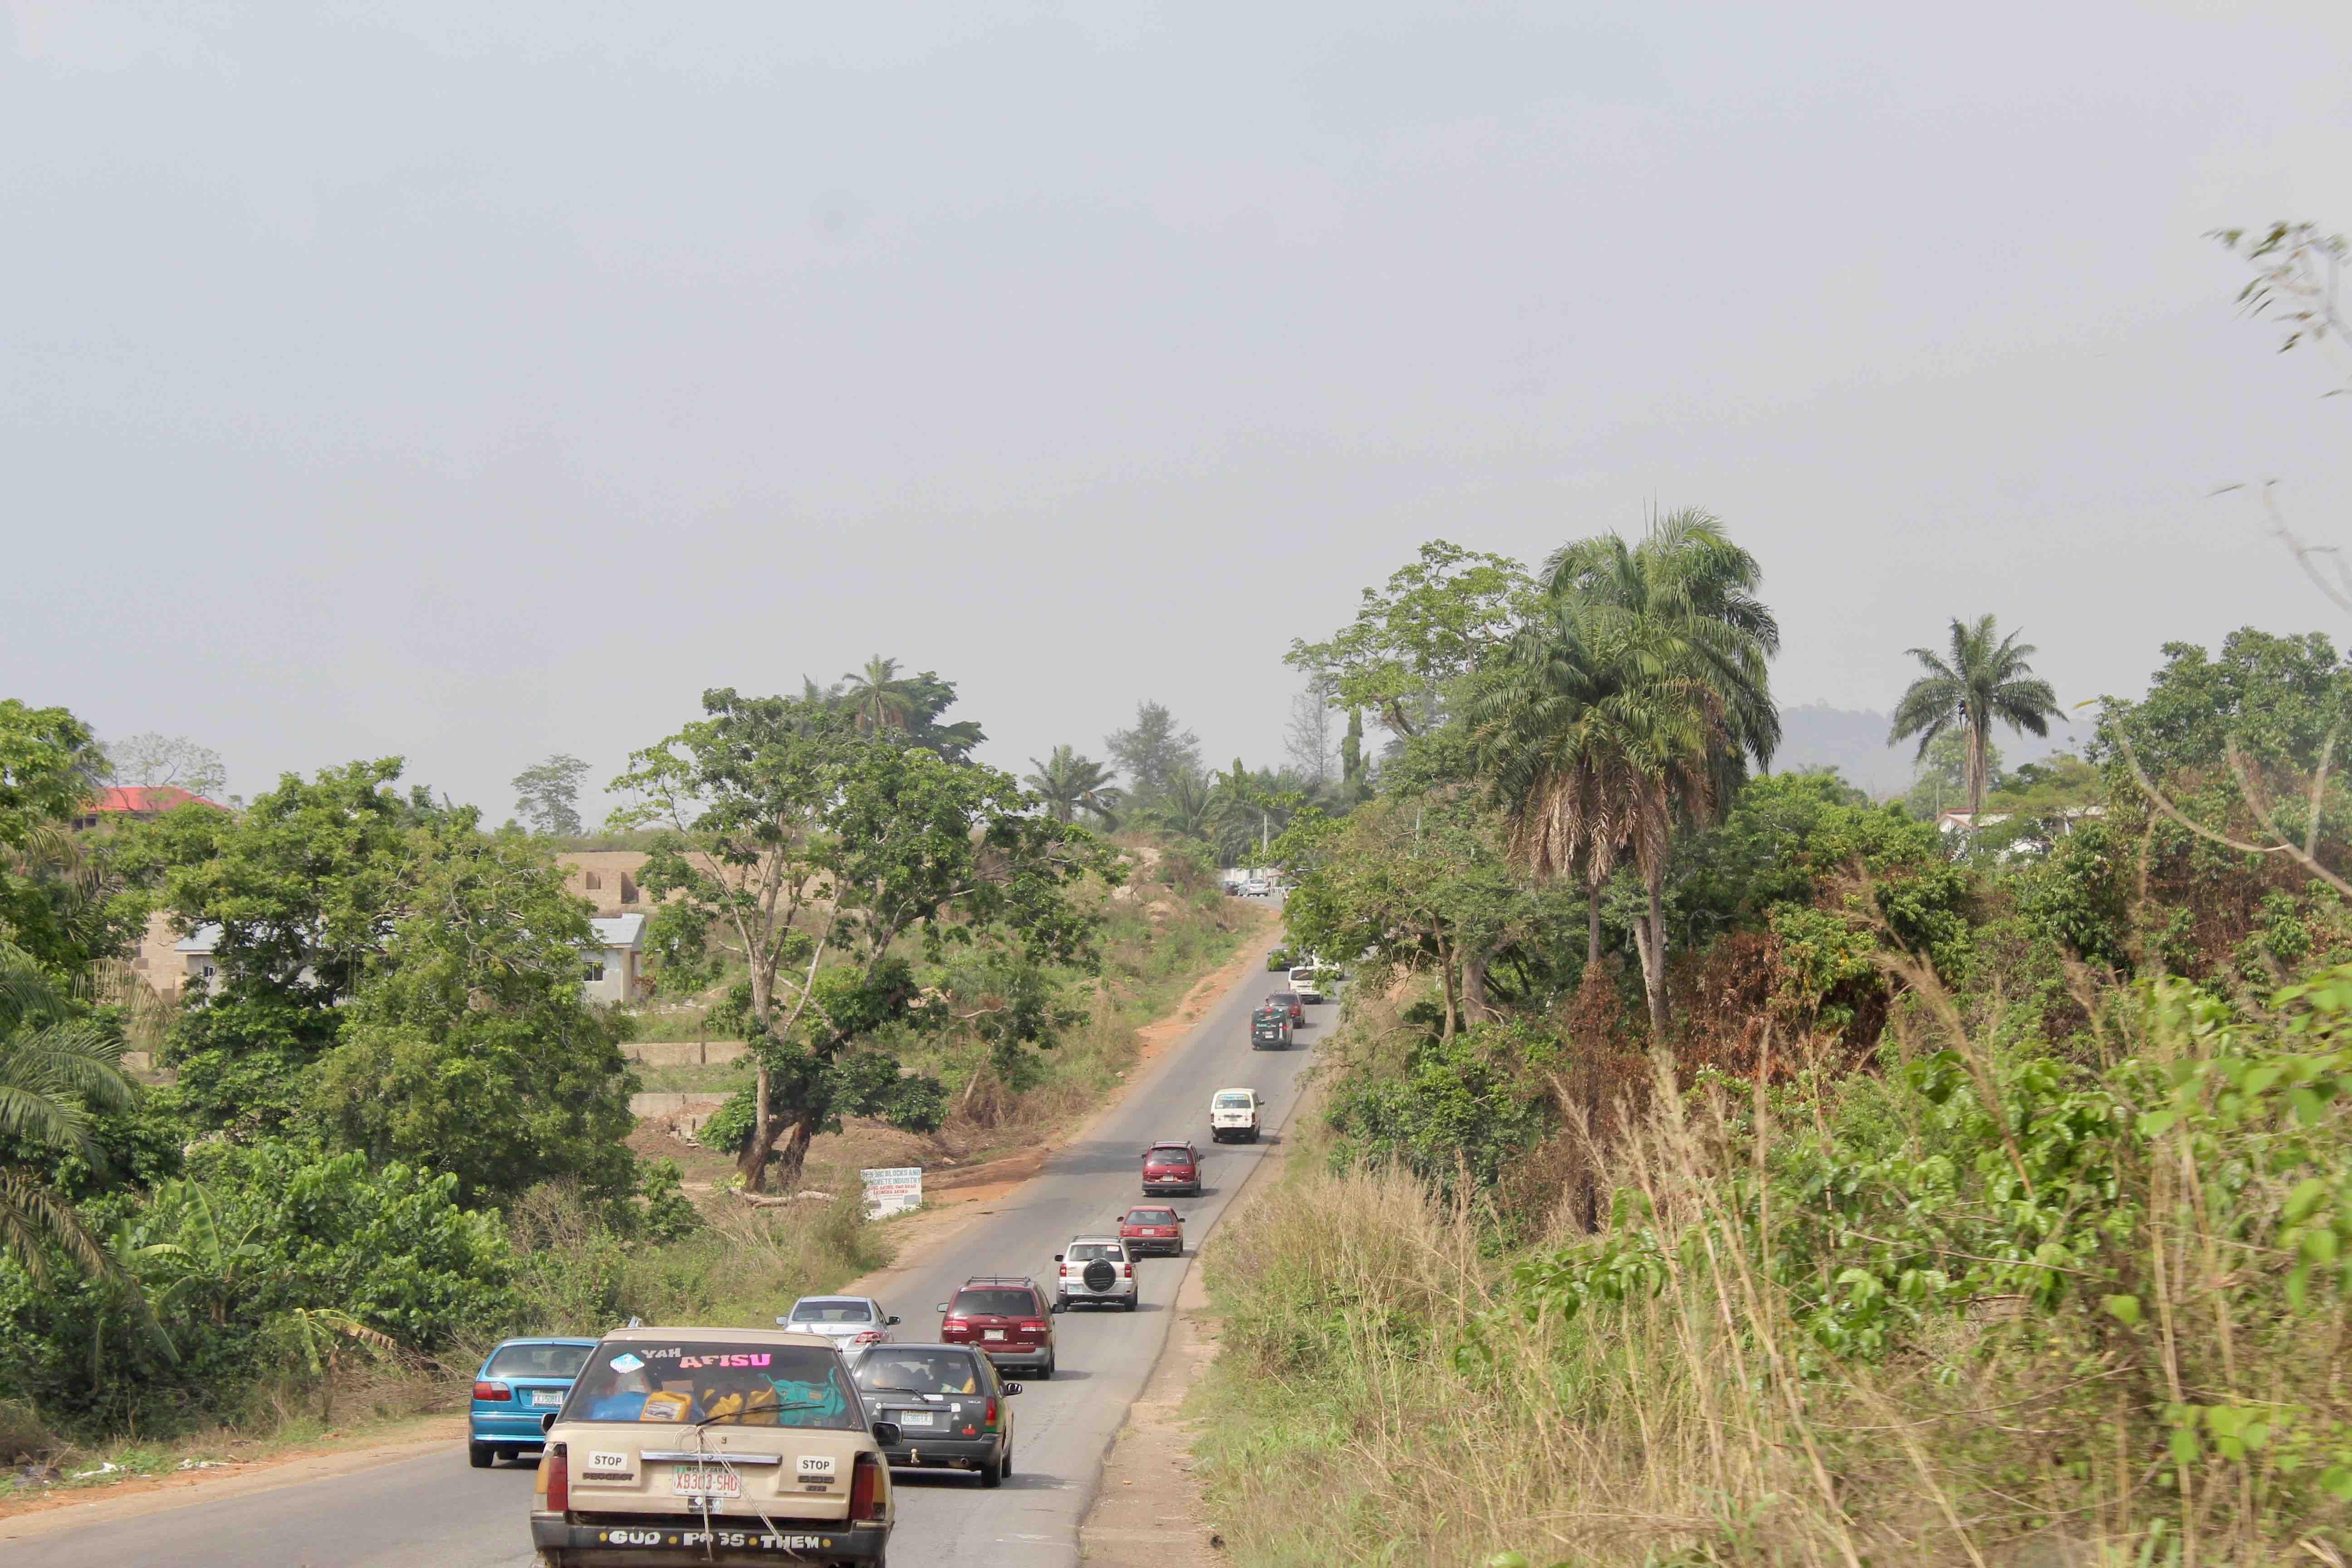 Akungba-Okene Road, Akungba, Ondo State, Nigeria. #JujuFilms